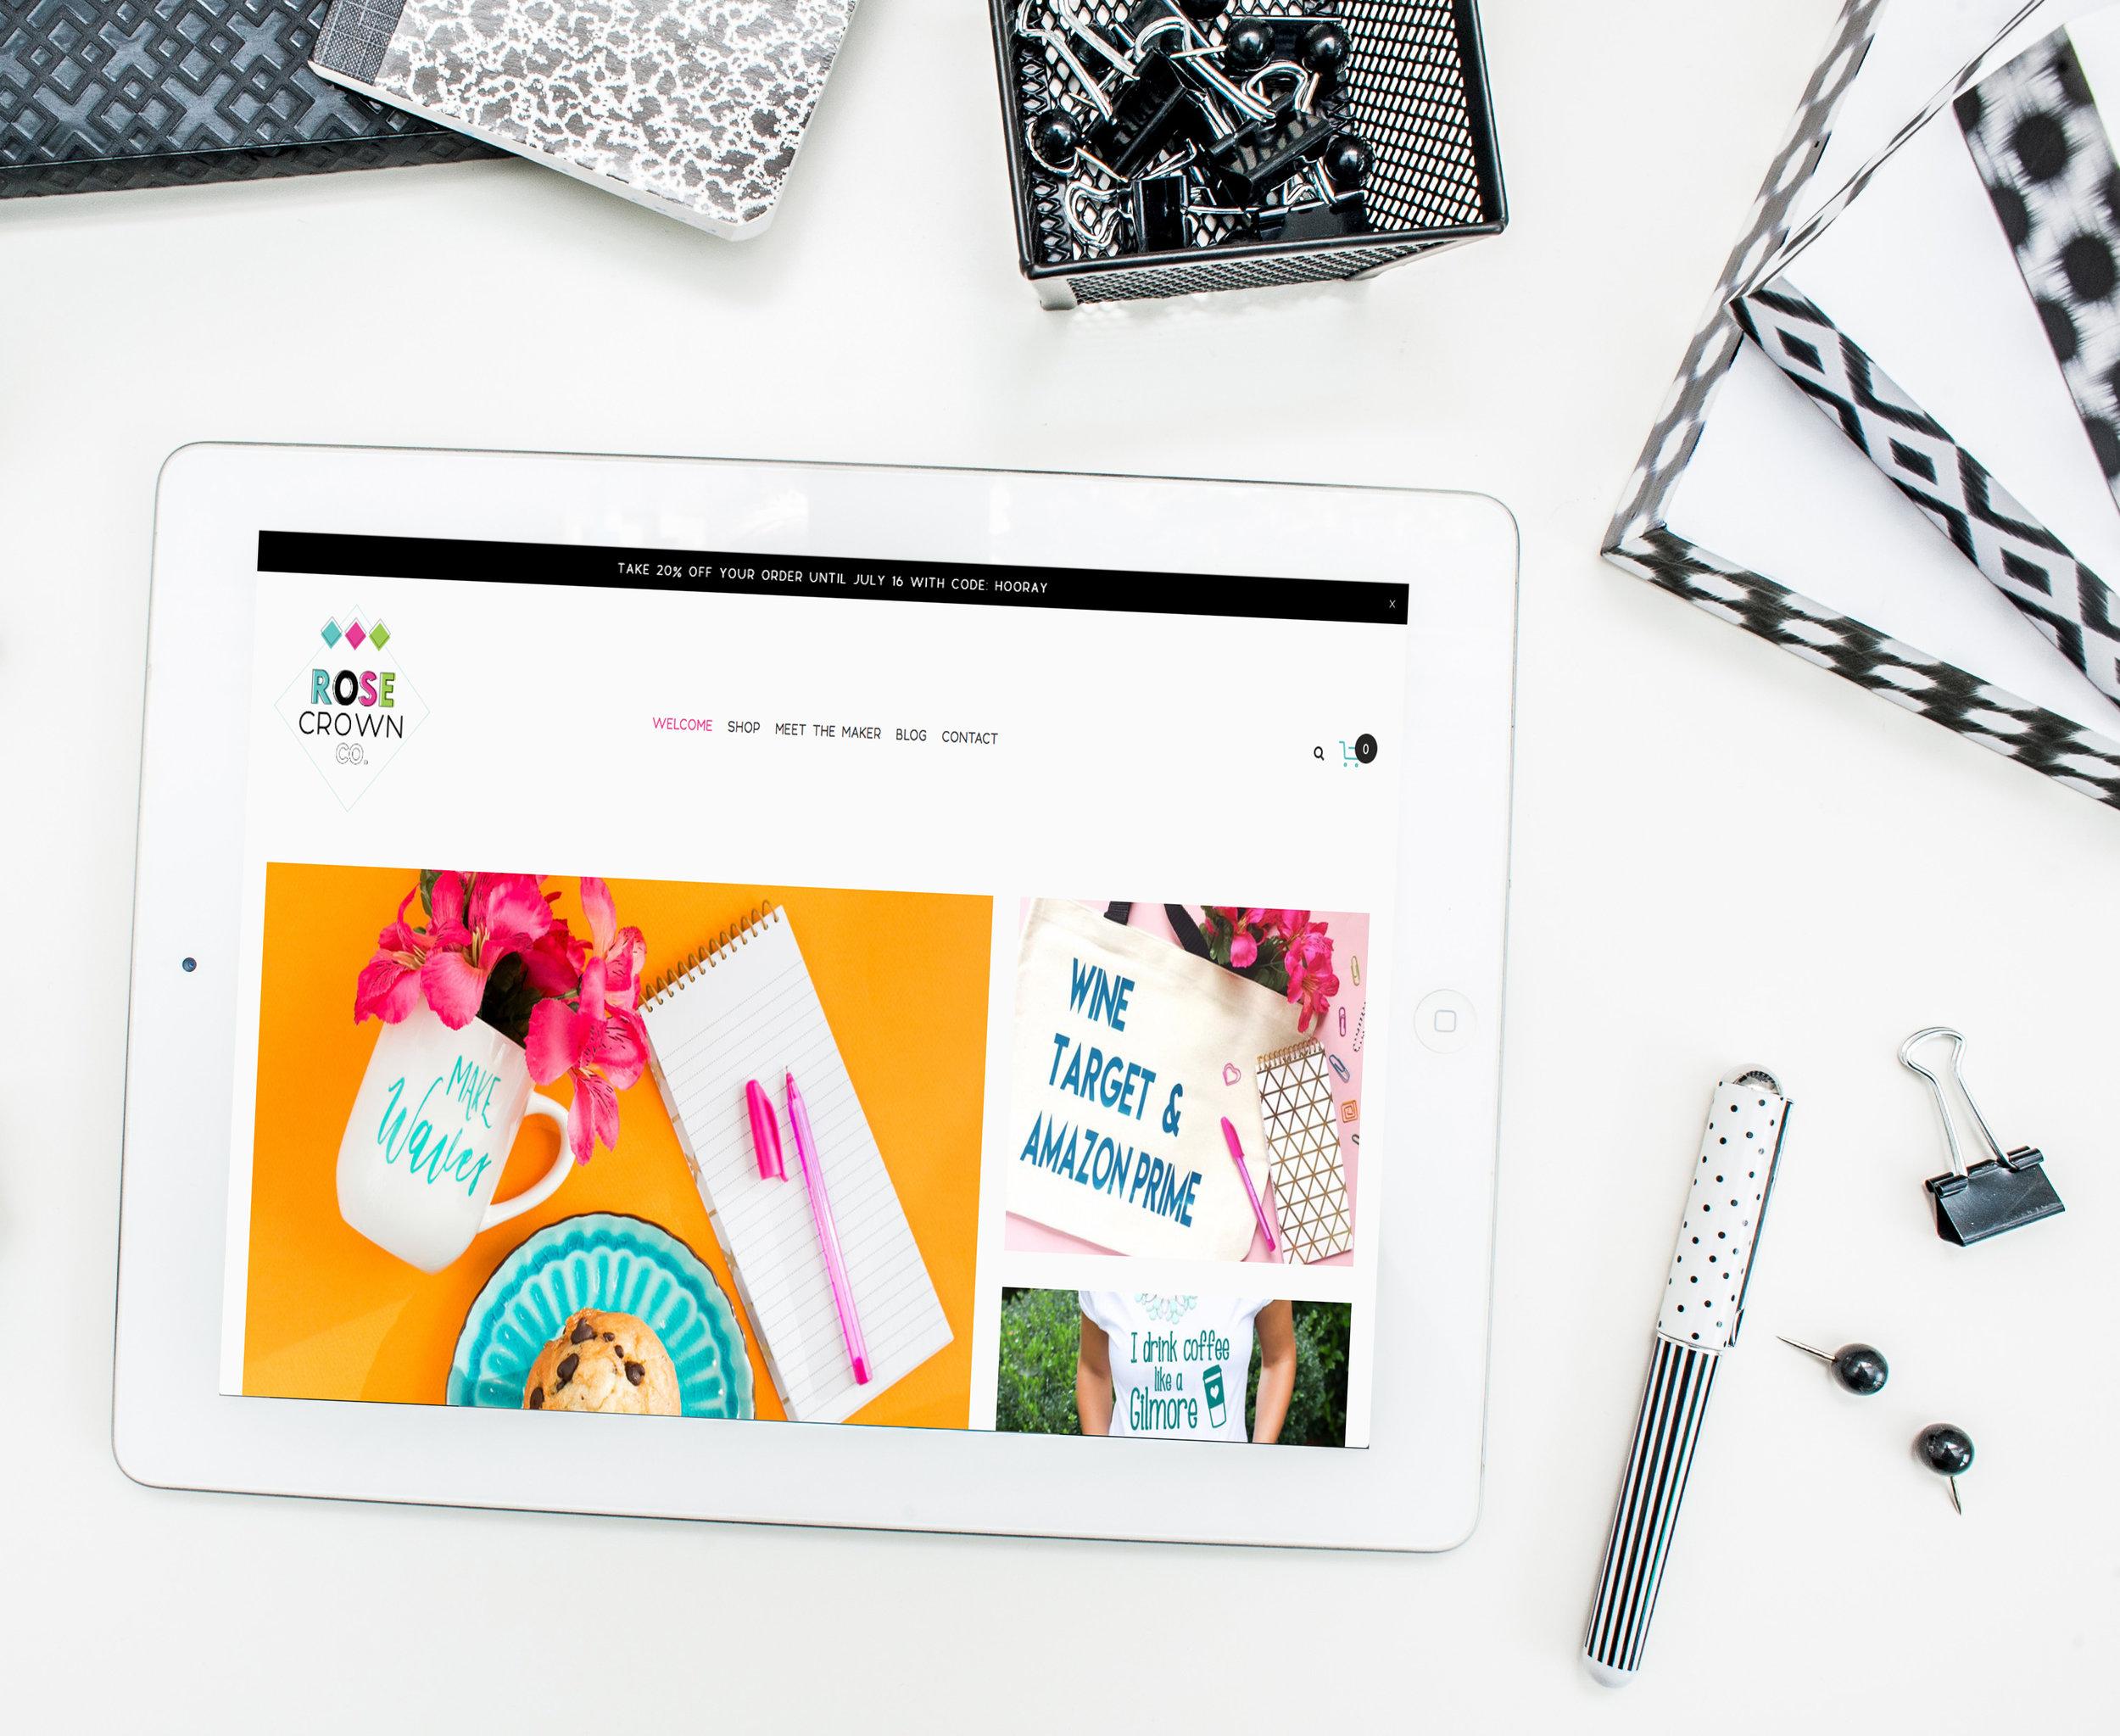 Rose Crown Co. e-commerce website design